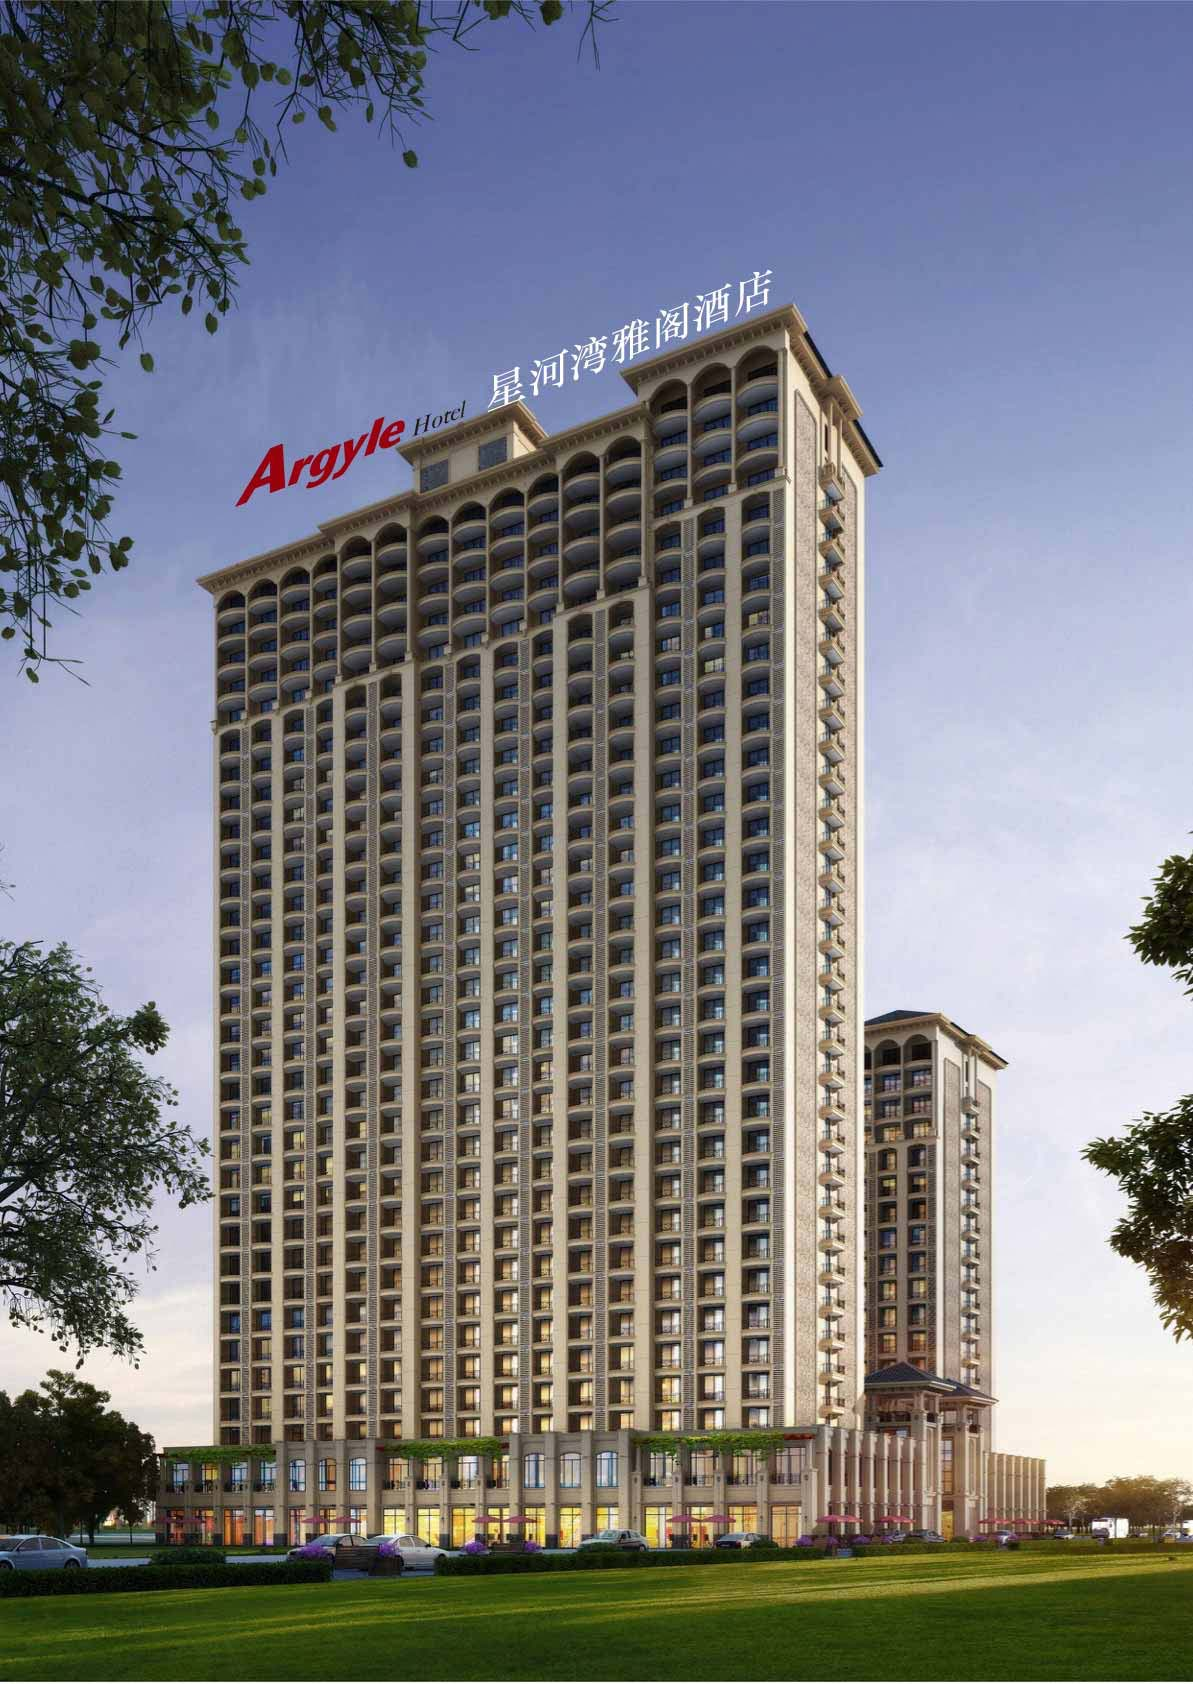 Argyle Hotel Guan